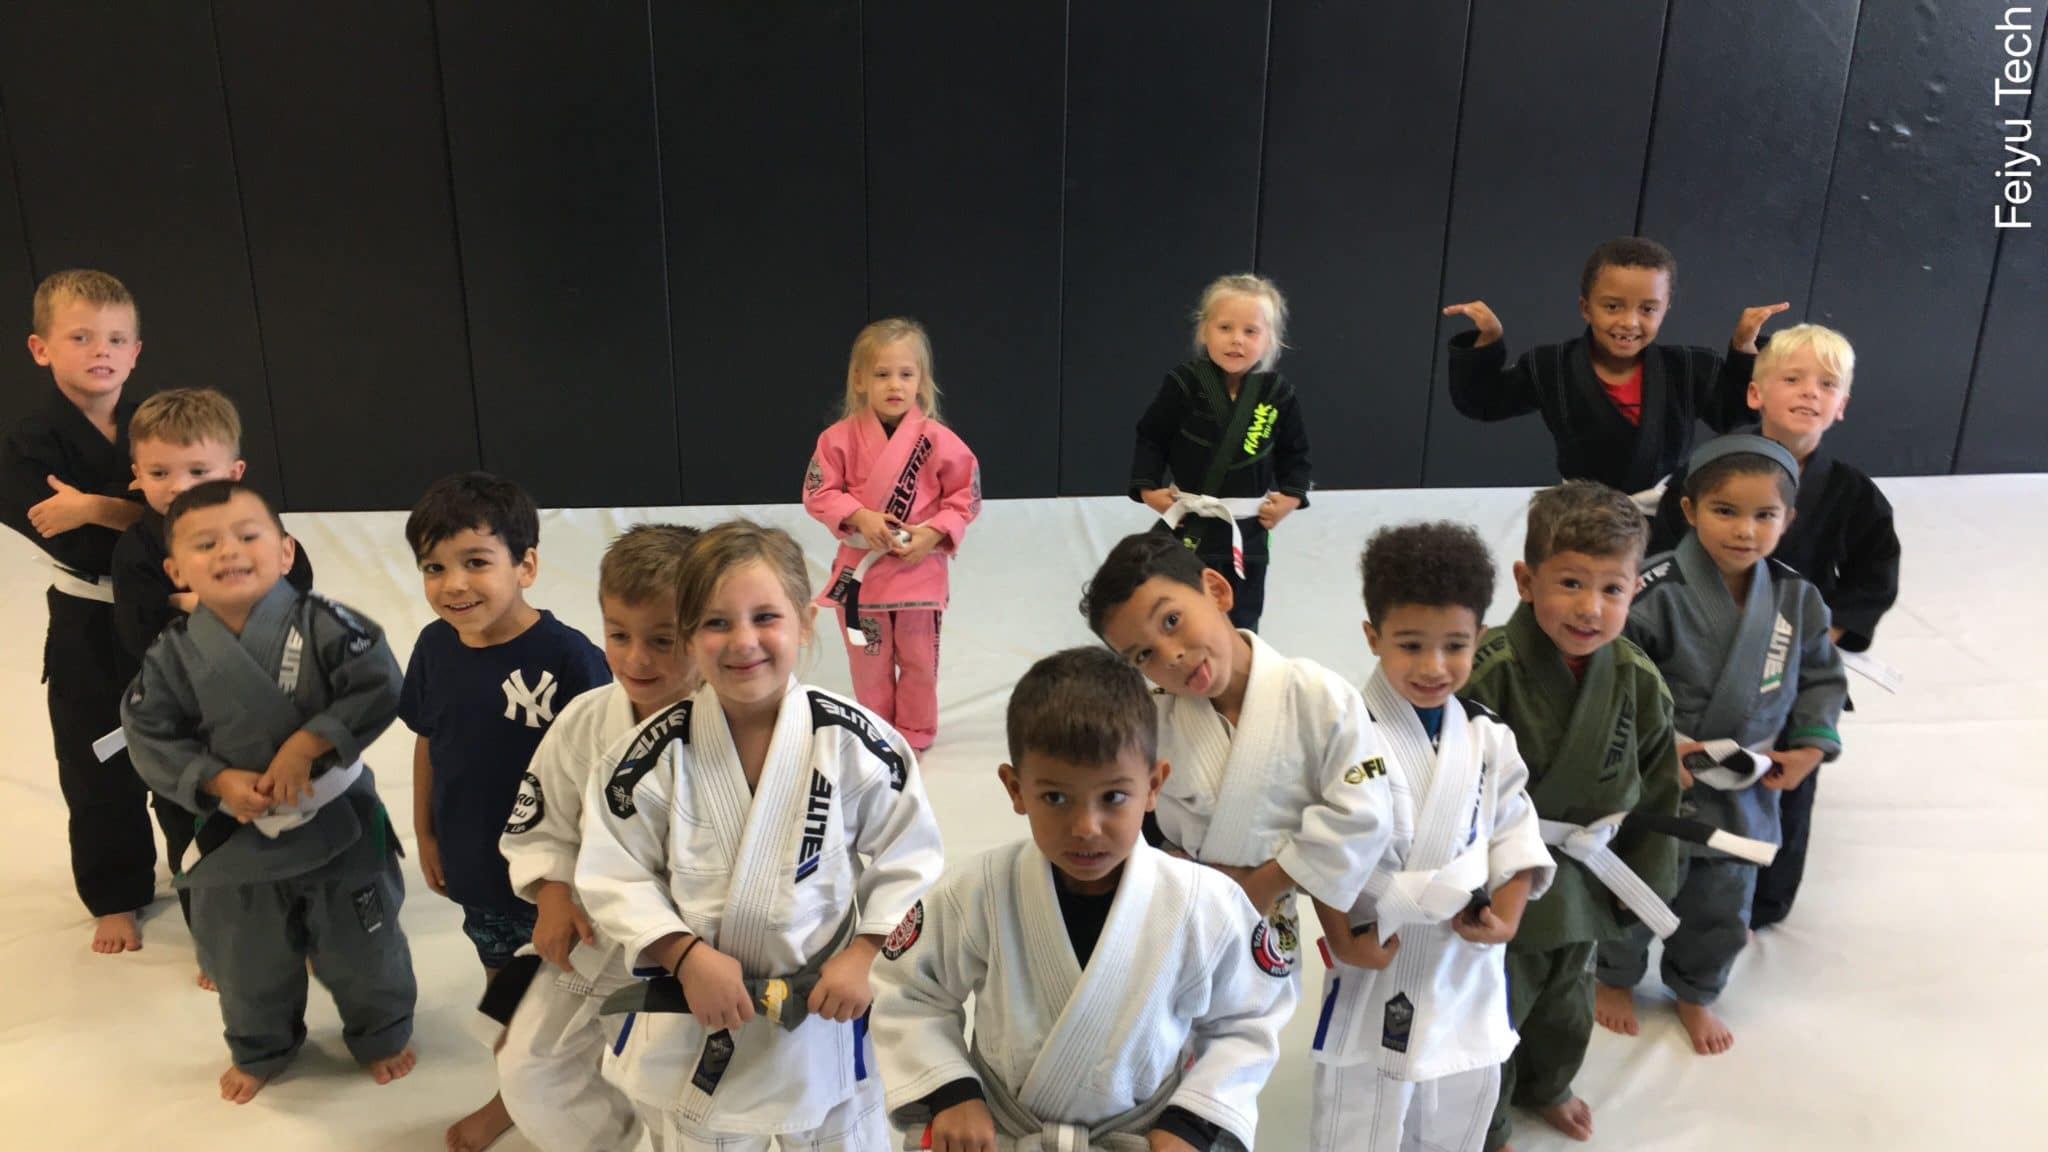 OBX Martial Arts Kids BJJ